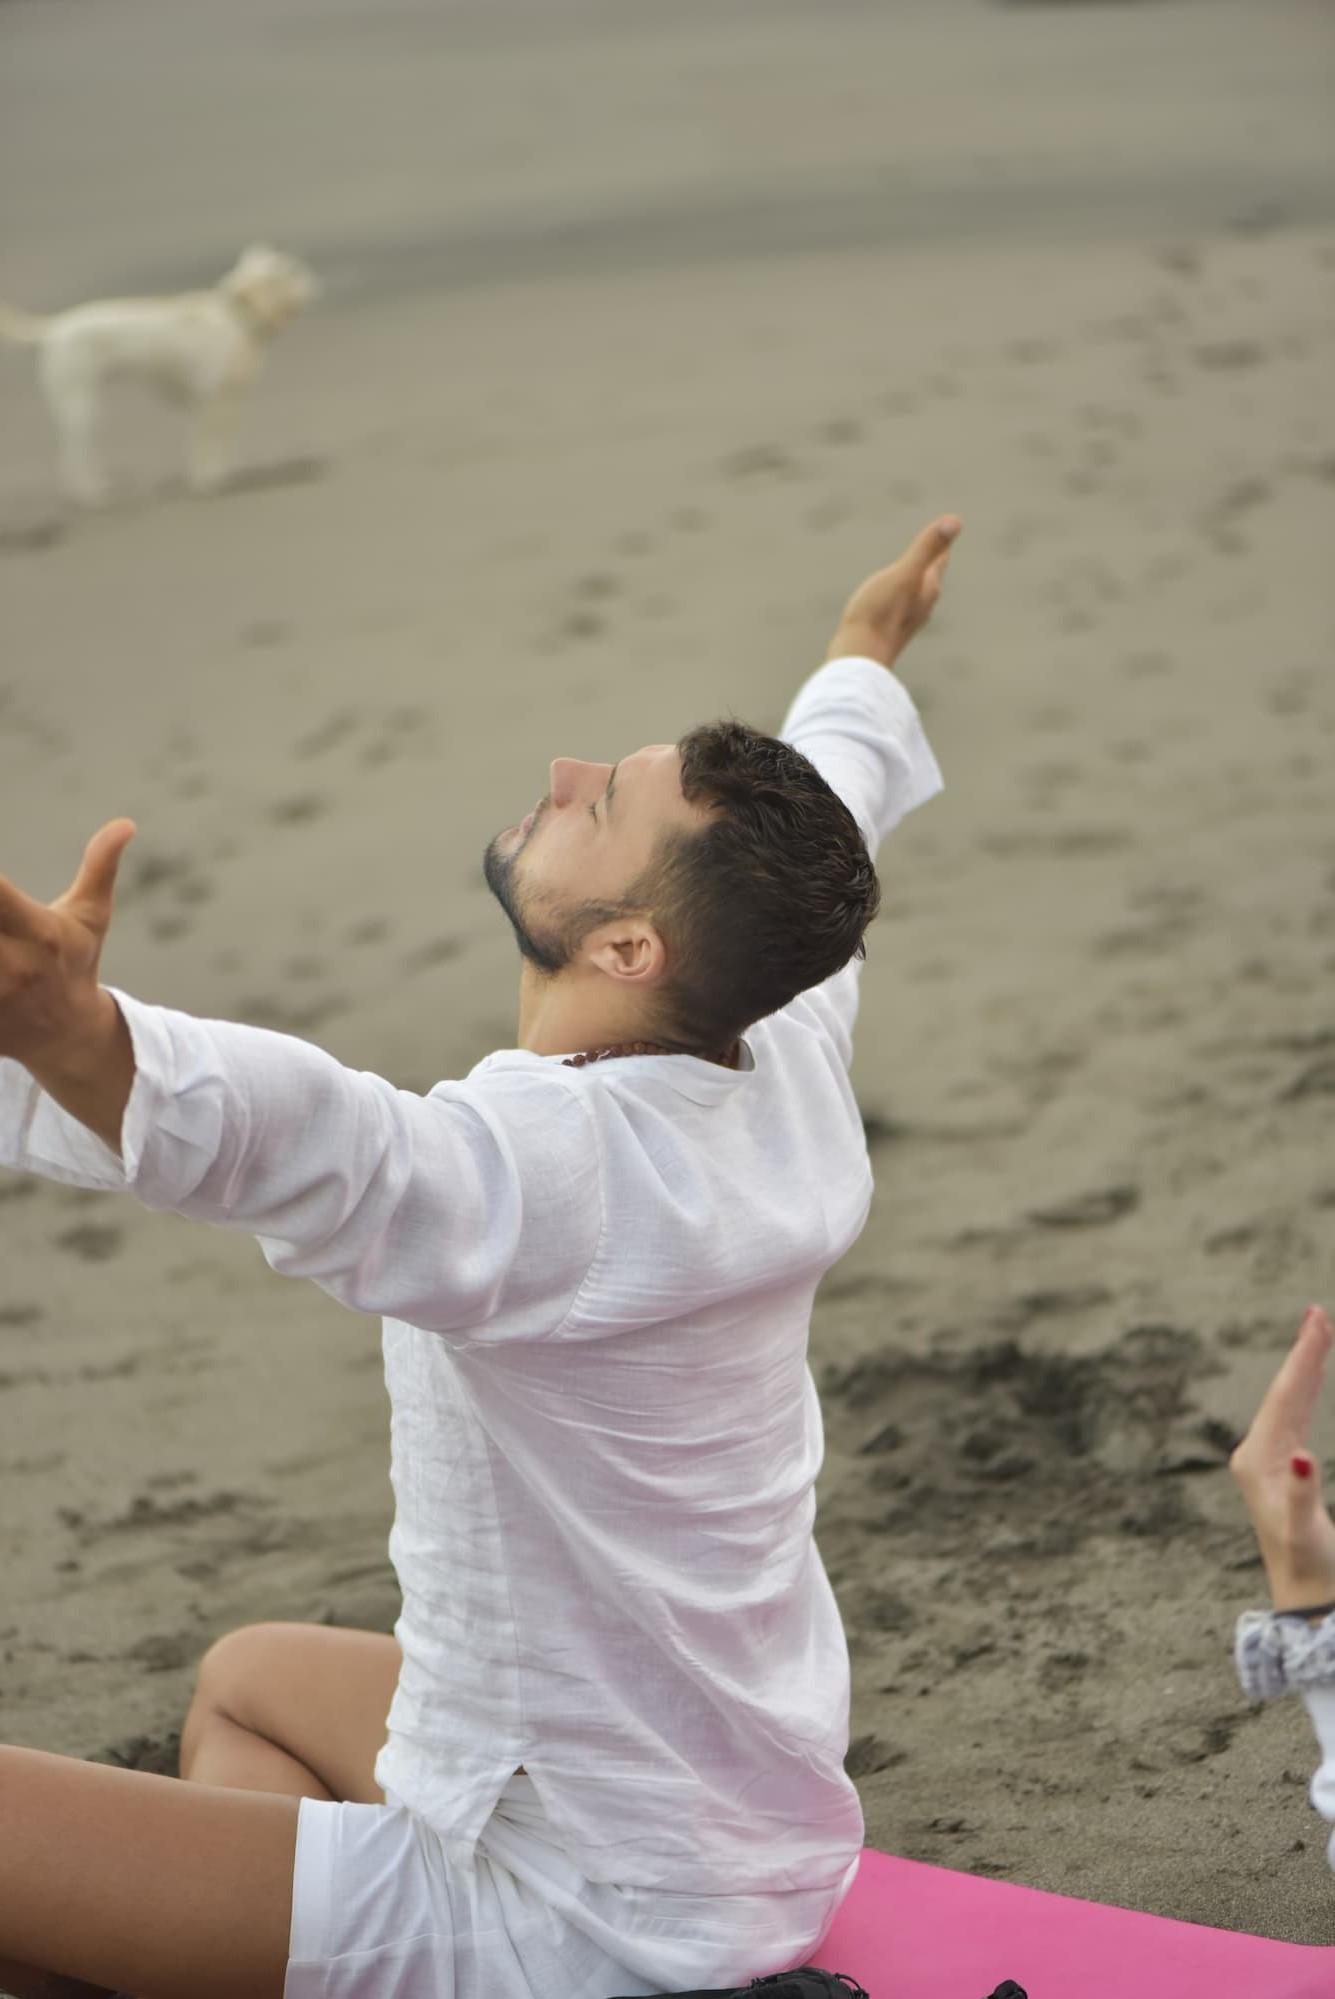 Tantra practices